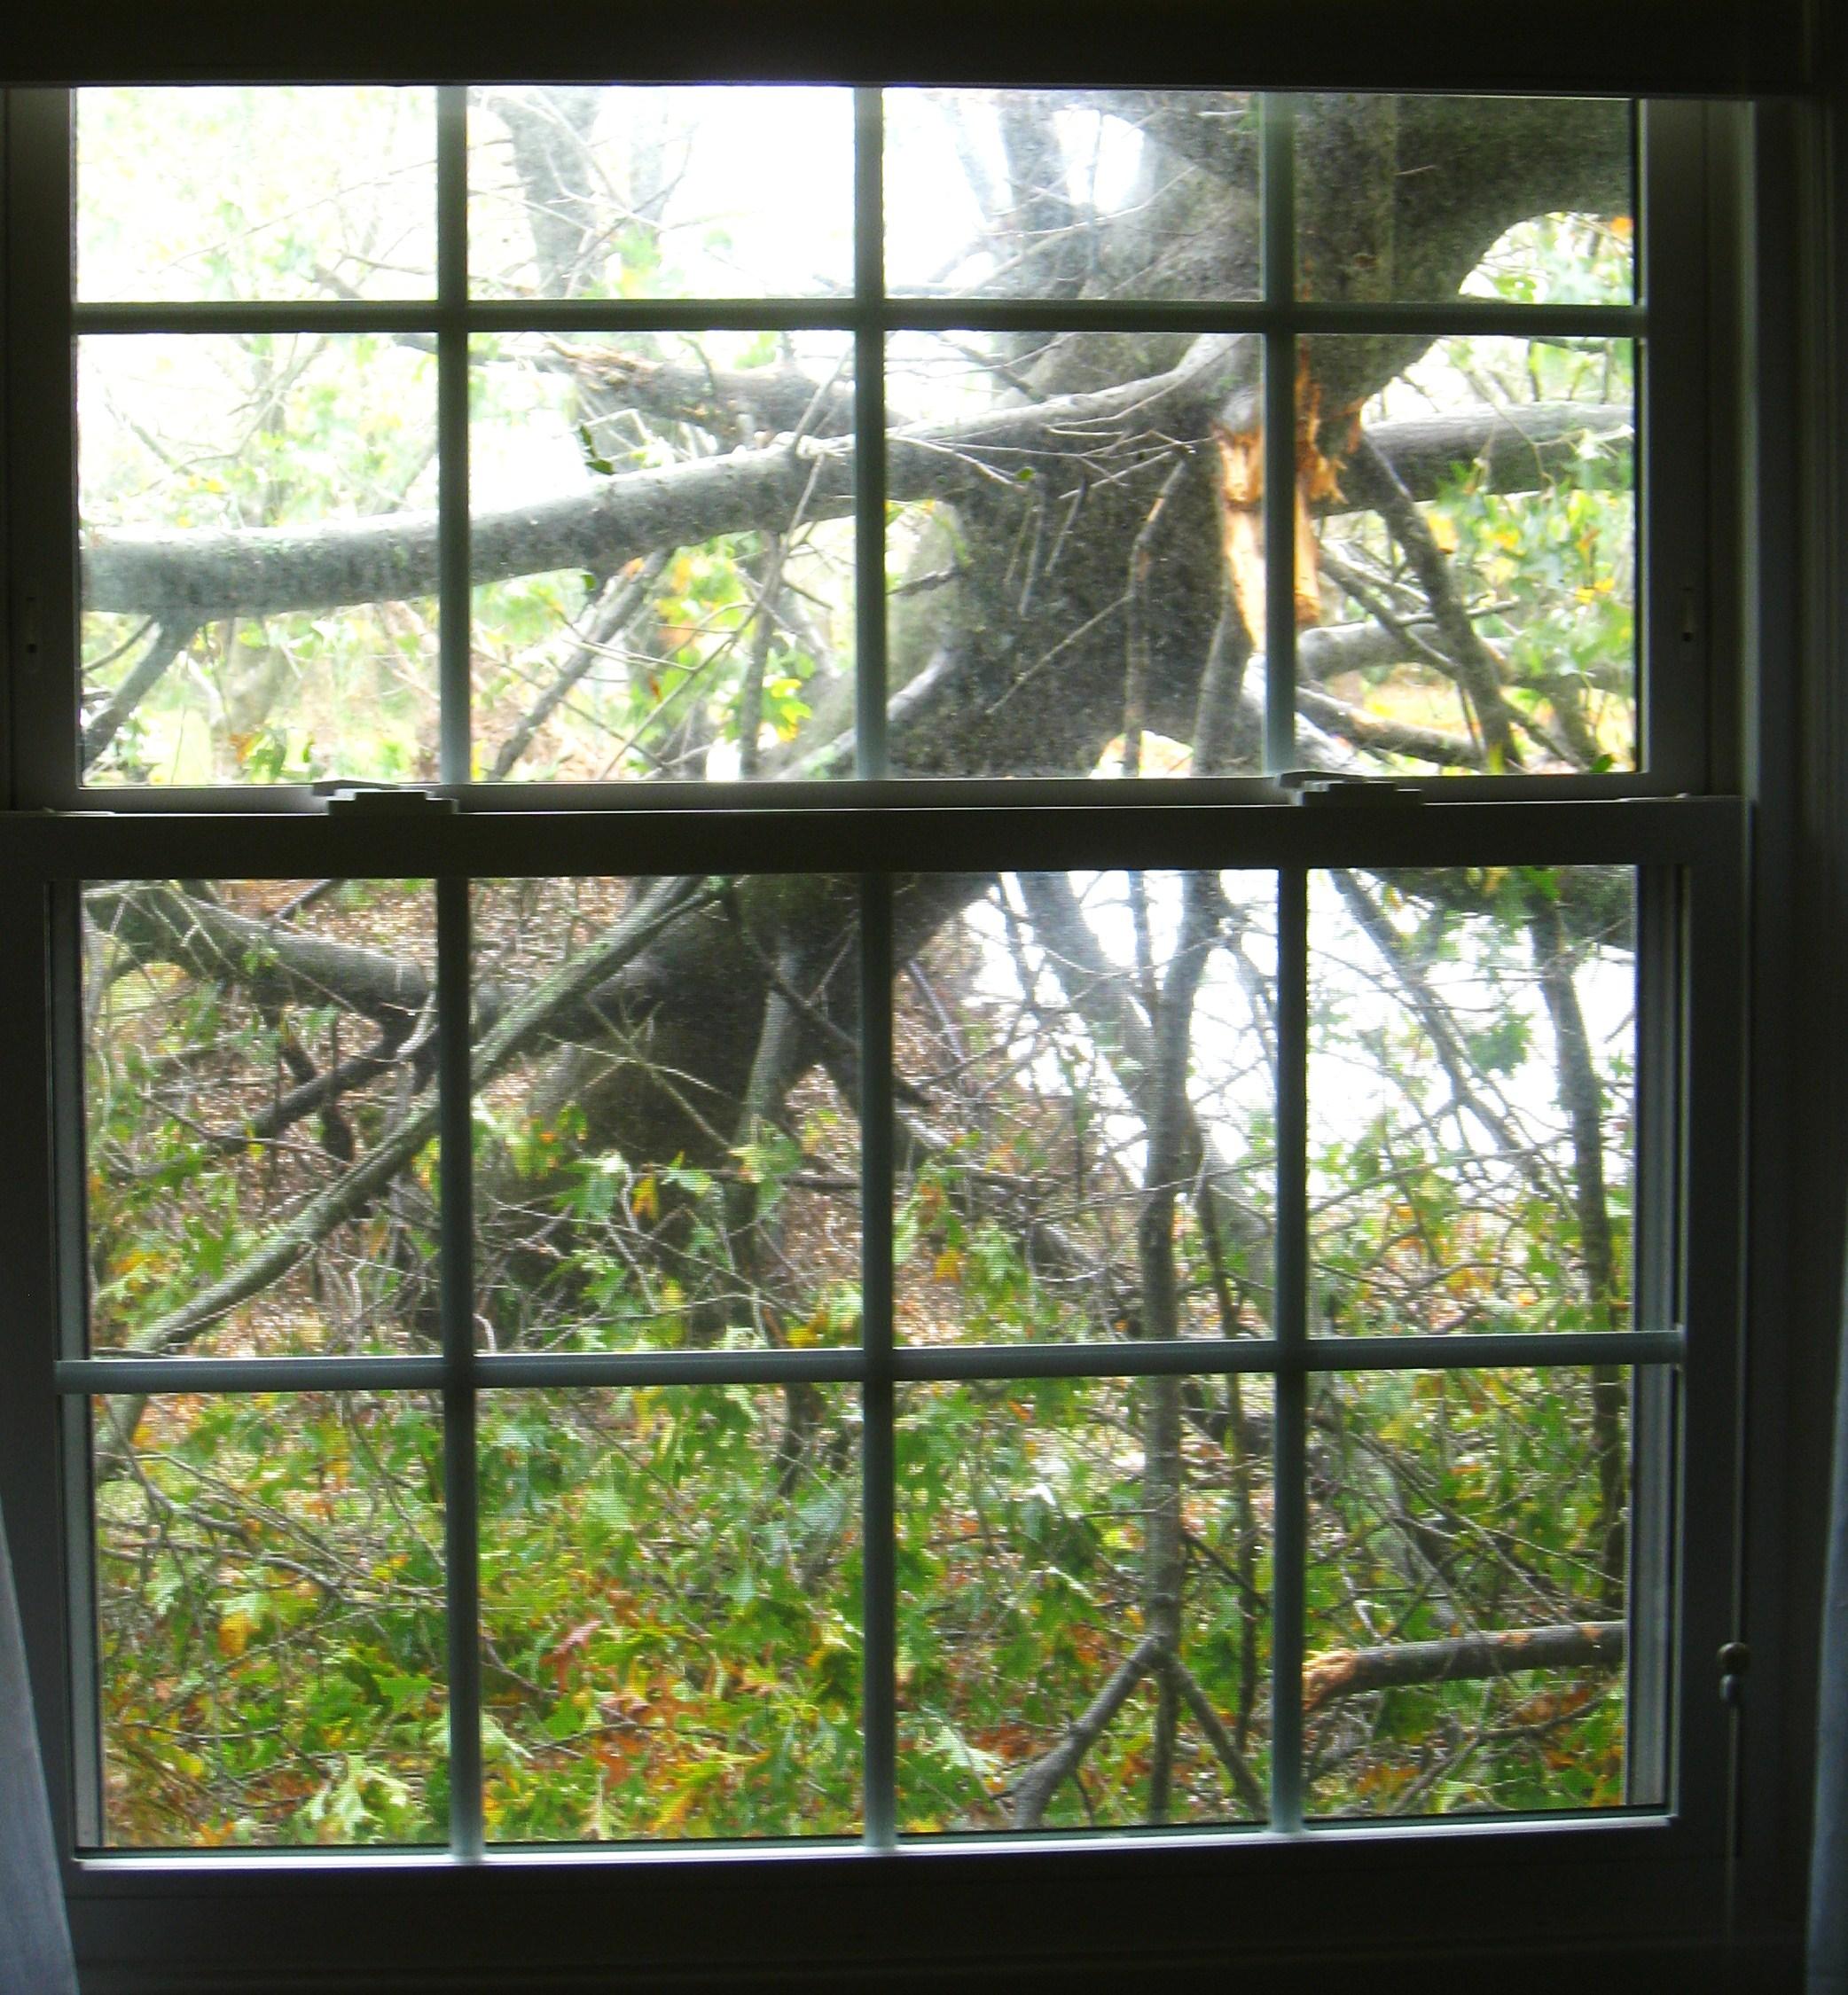 hurricane-damage-tree-right-front-window